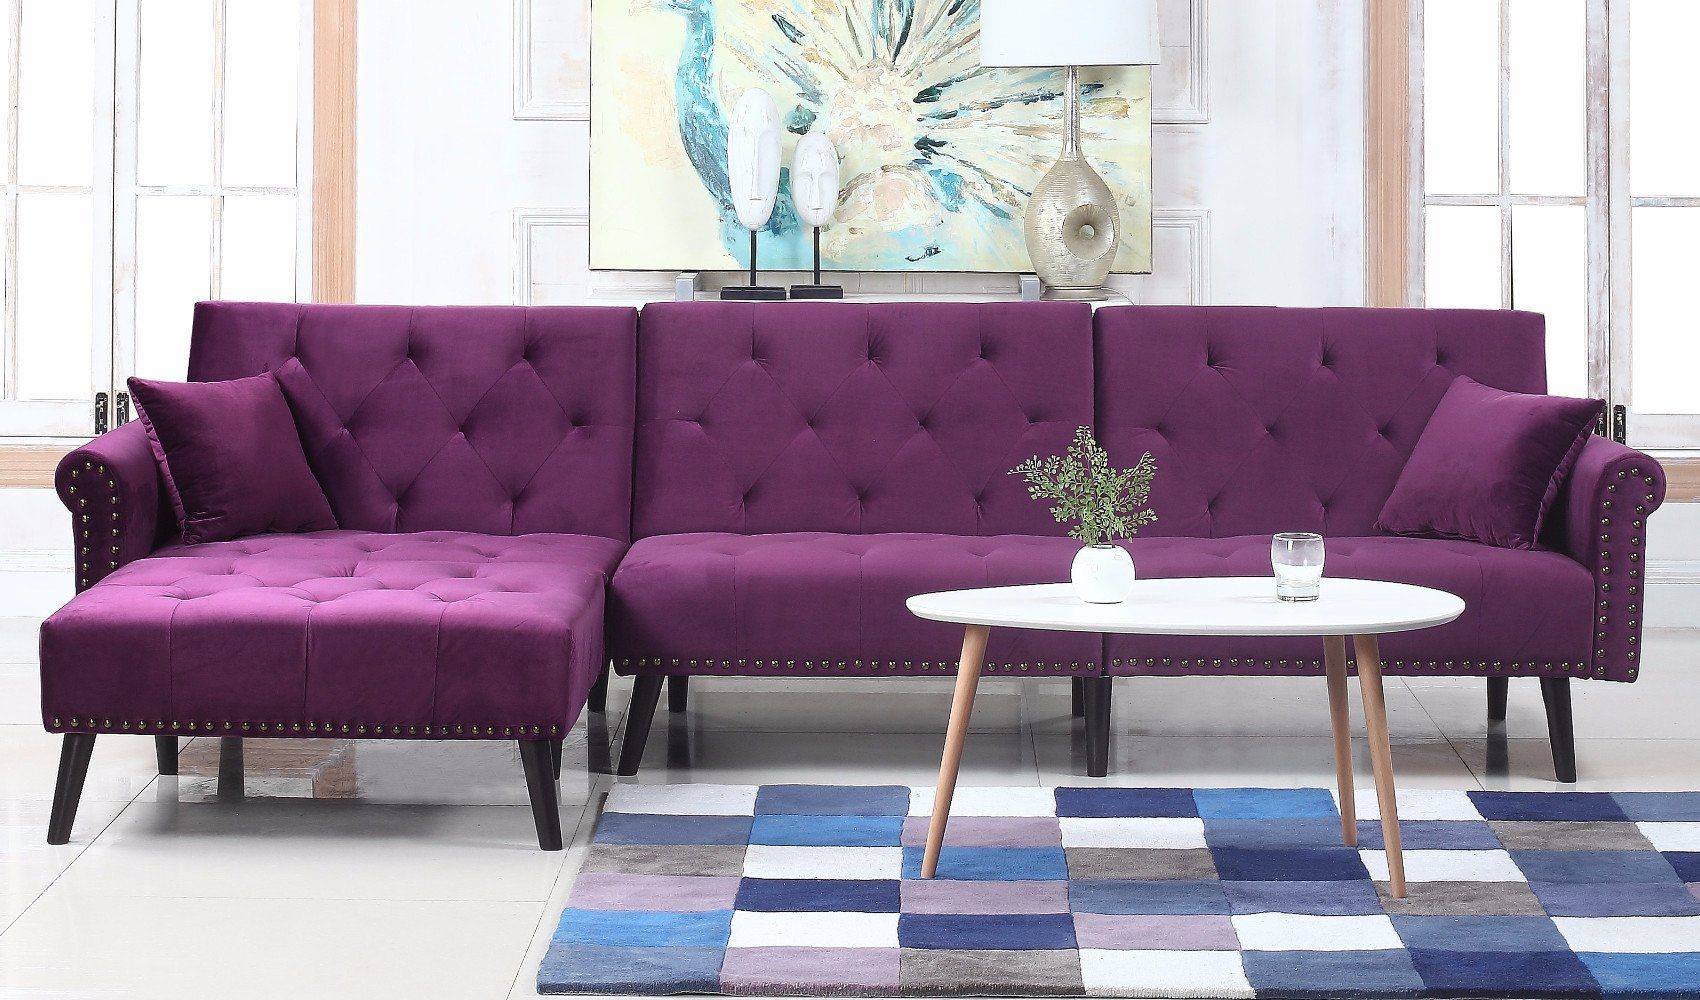 Velvet Sleeper Futon Sofa L Shape Sectional Couch w/ Reclining Backrest u0026 Chaise Lounge : purple sectional sofa chaise - Sectionals, Sofas & Couches